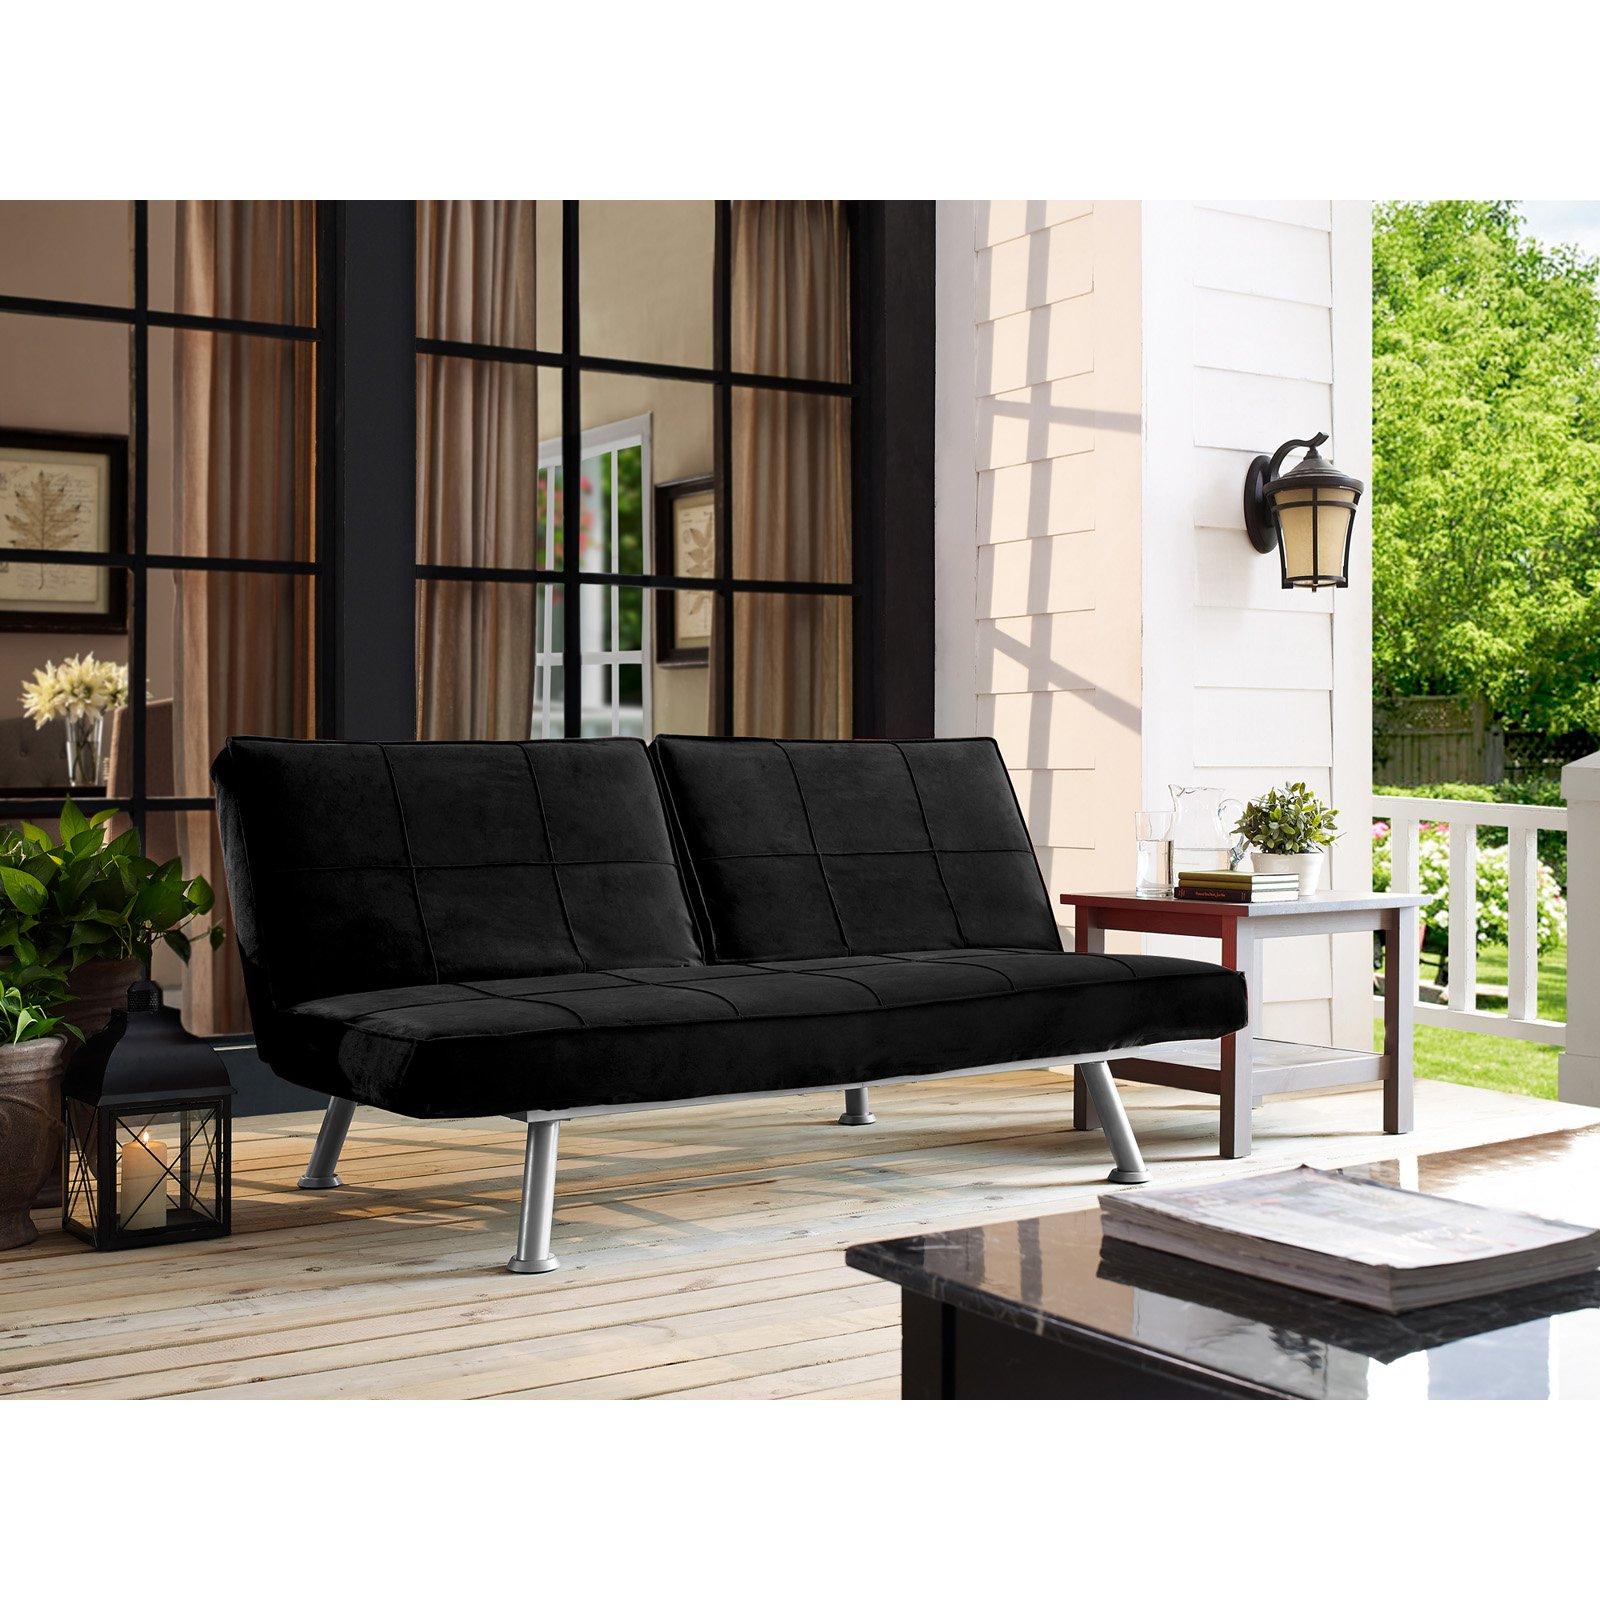 Lifestyle Serta Marshall Dream Convertible Sofa